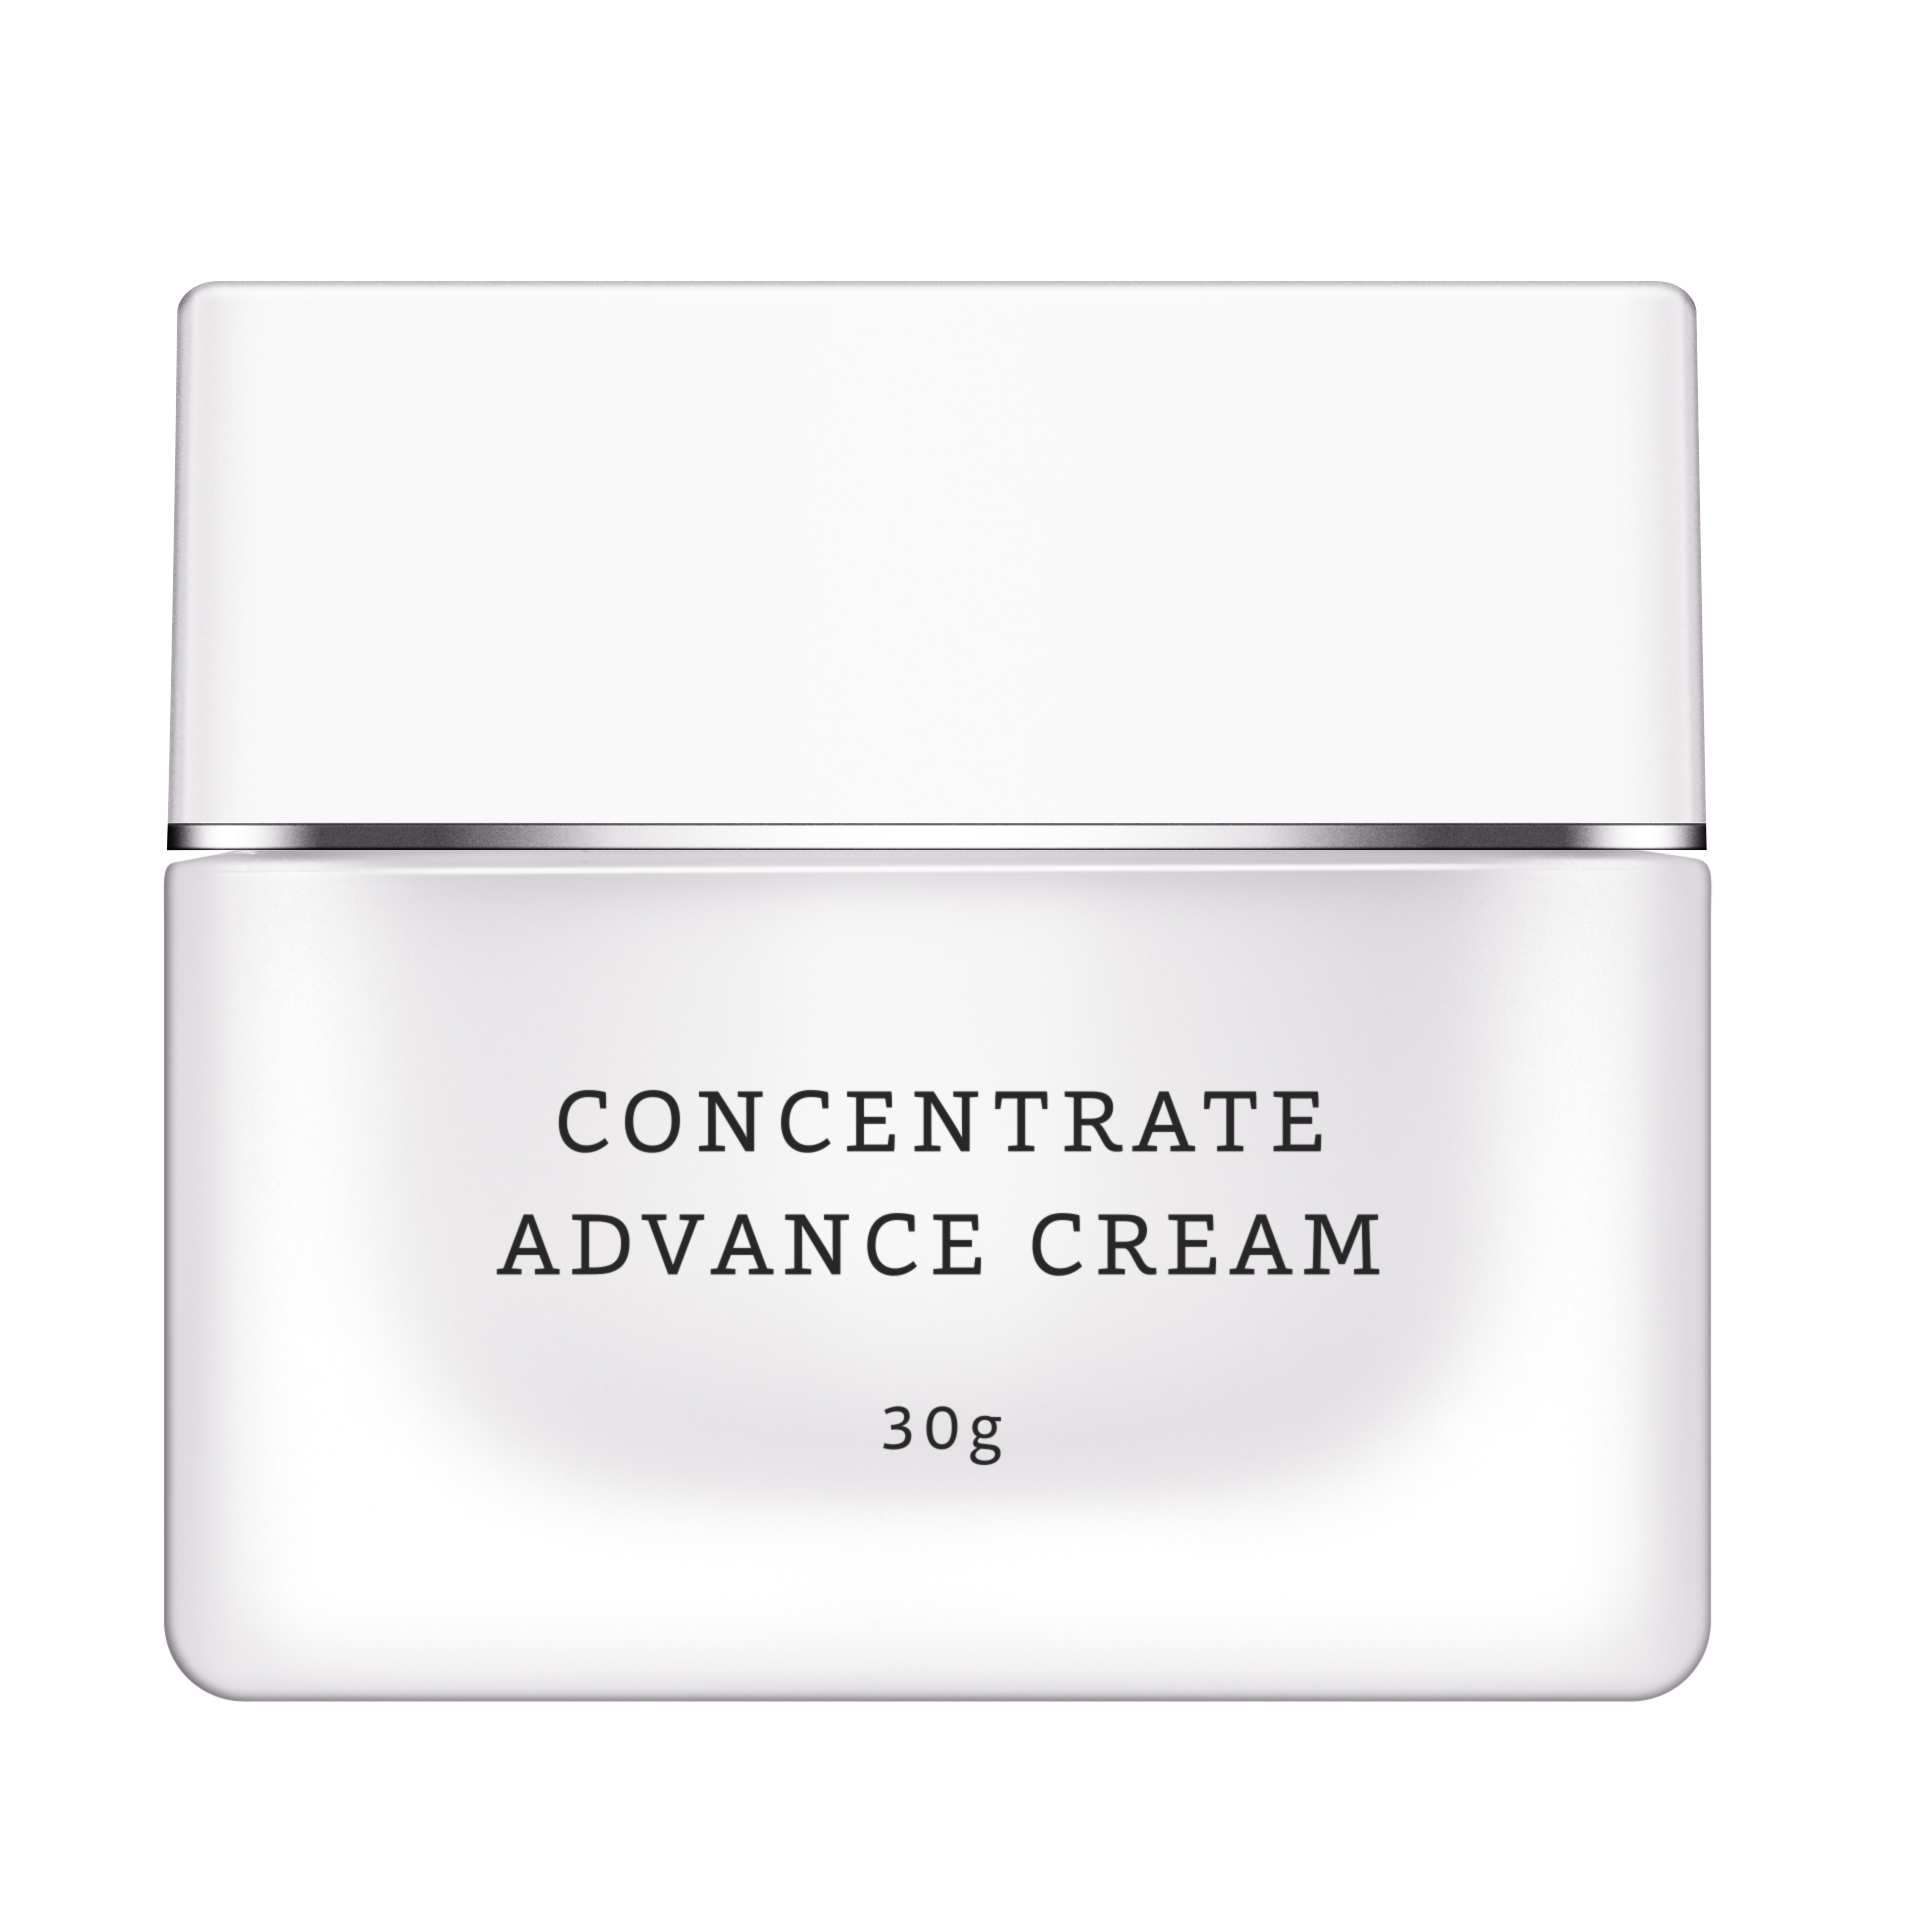 RMK 臉部保養系列*-高效煥膚修護凝霜 CONCENTRATE ADVANCE CREAM